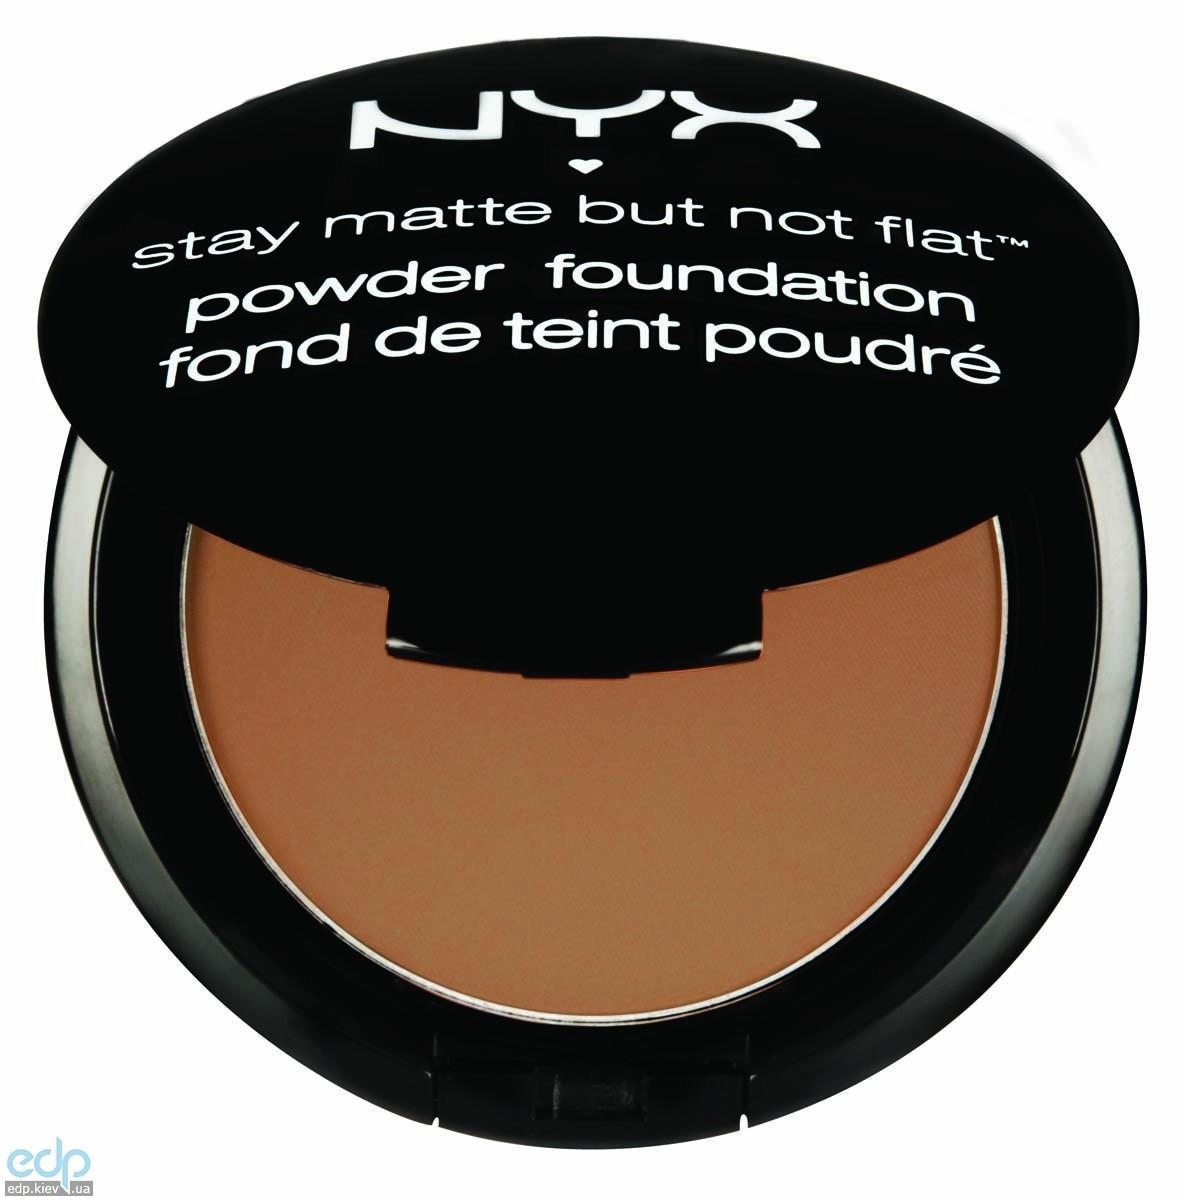 NYX - Матирующая пудра Stay Matte But Not Flat Caramel SMP10 - 7.5 g